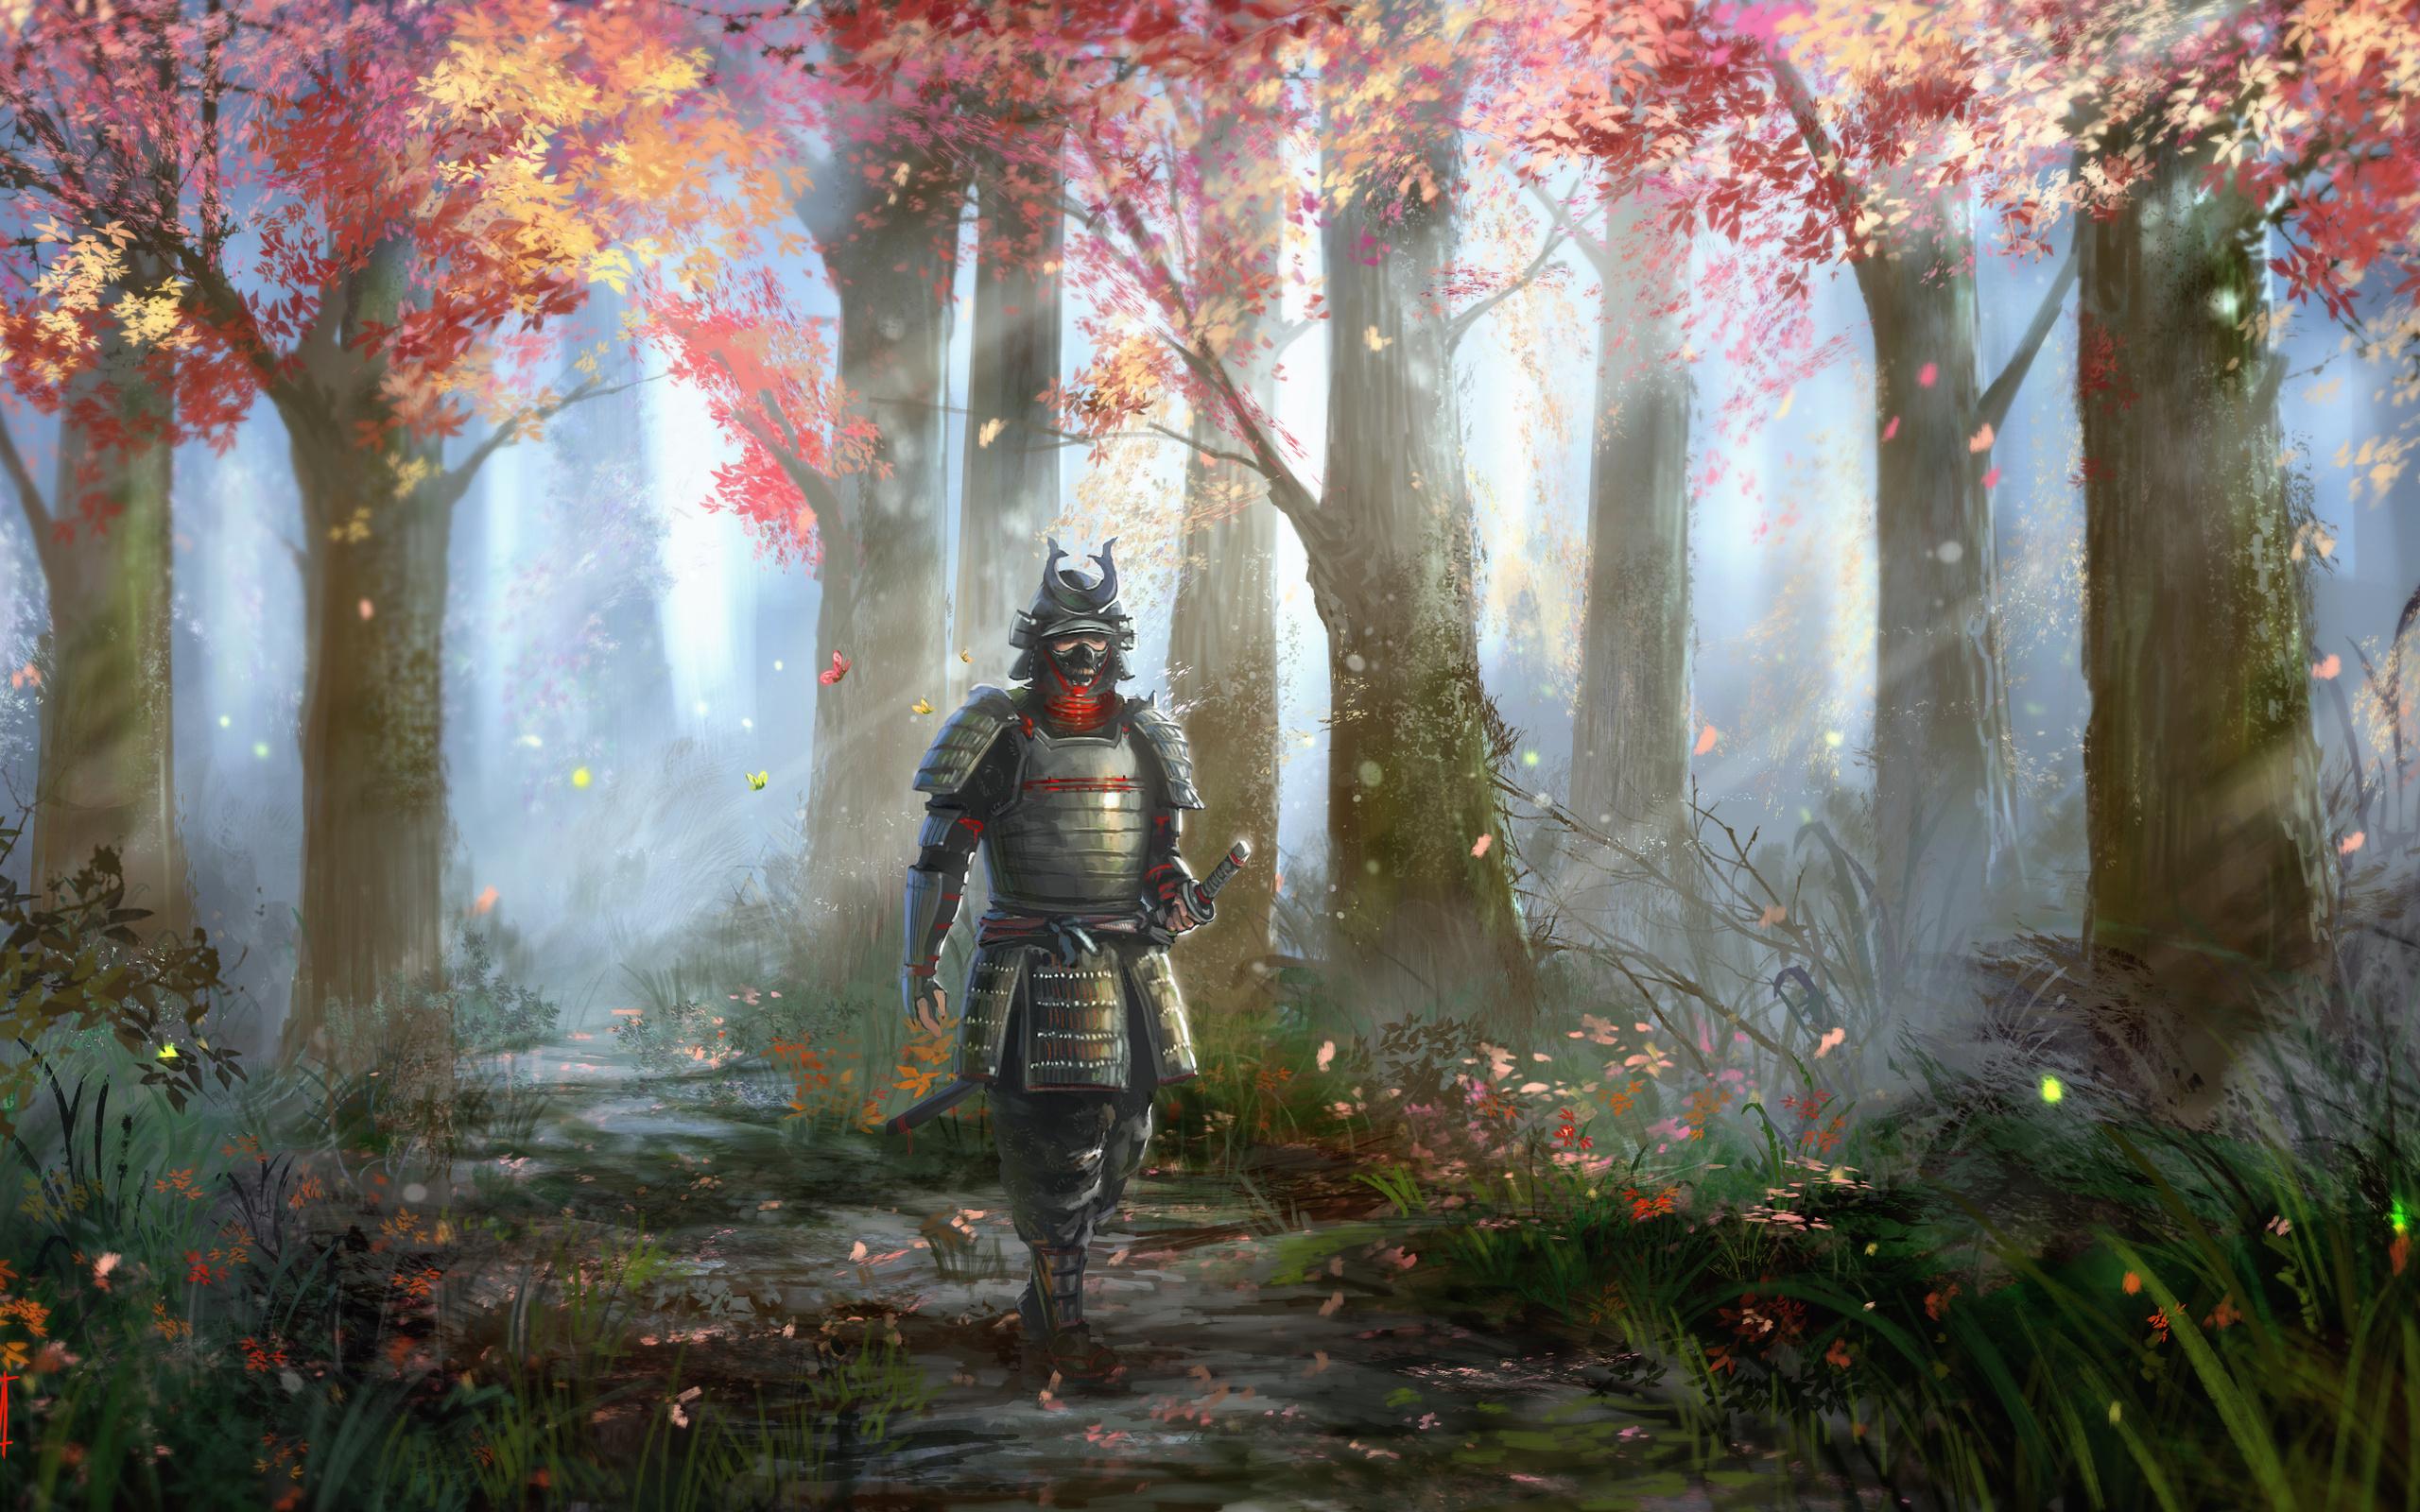 samurai full hd wallpaper and background | 2560x1600 | id:441248